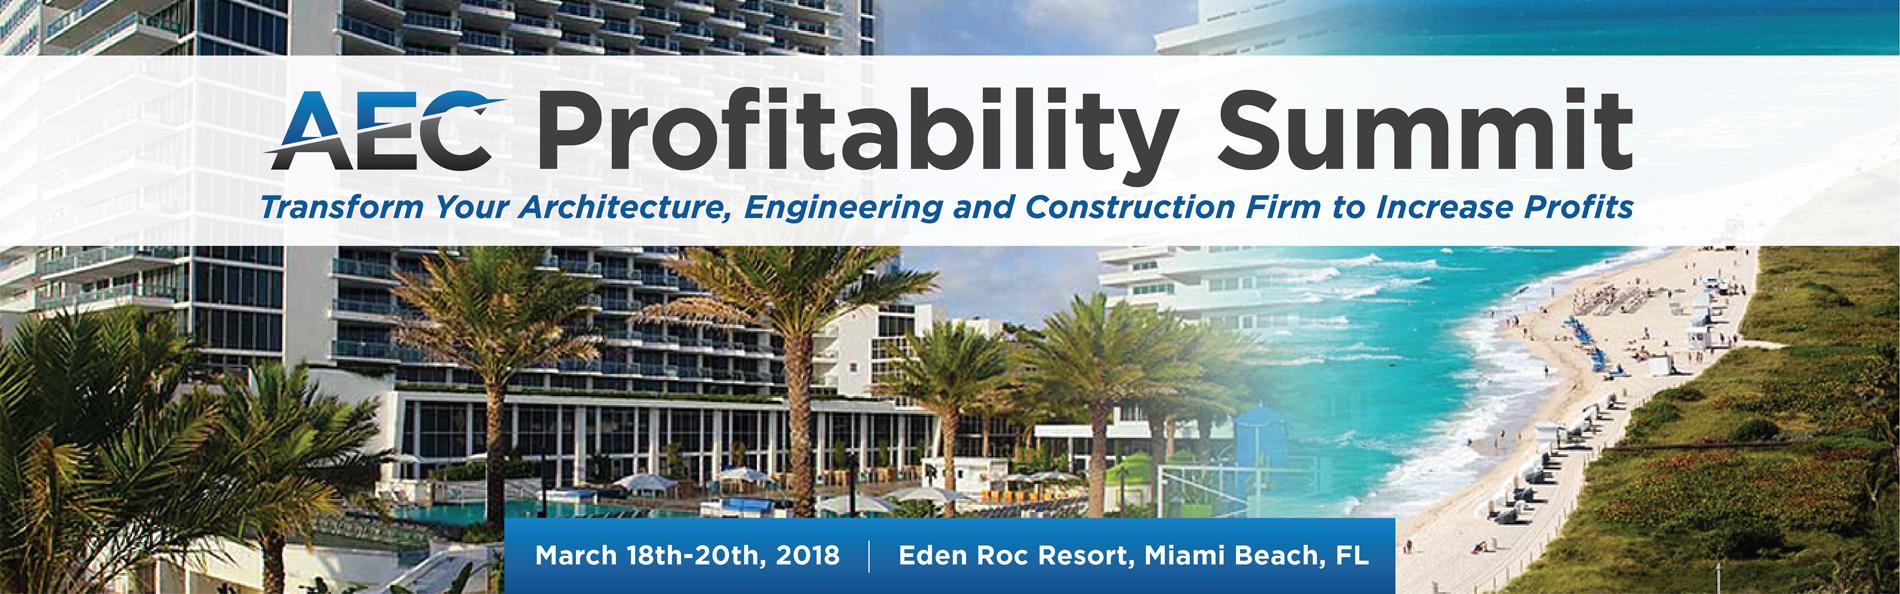 AEC-Profitability-Summit-2018-Banner